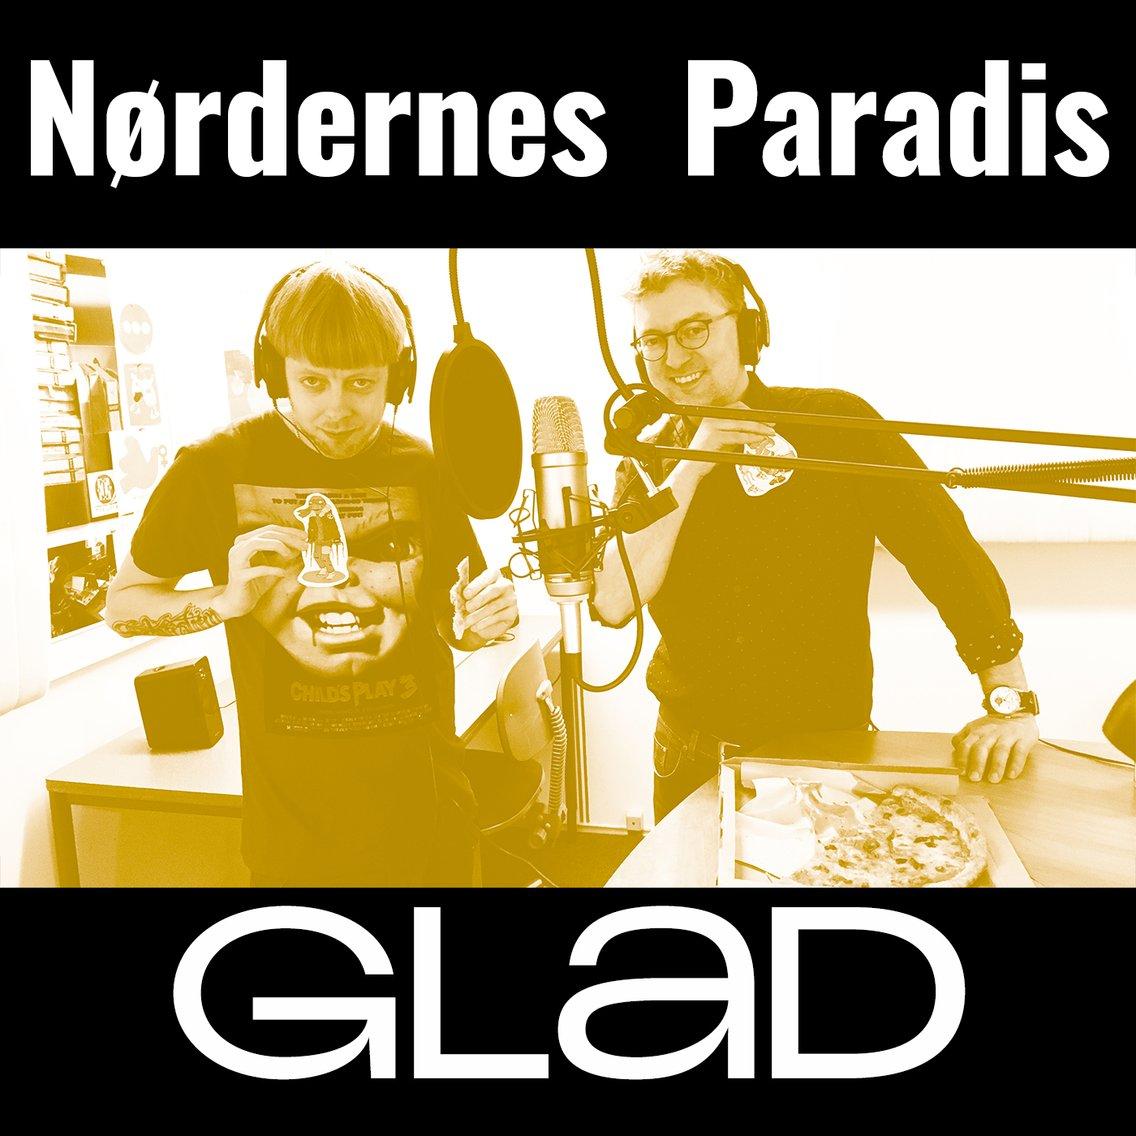 RADIO GLAD - Nørdernes paradis - immagine di copertina